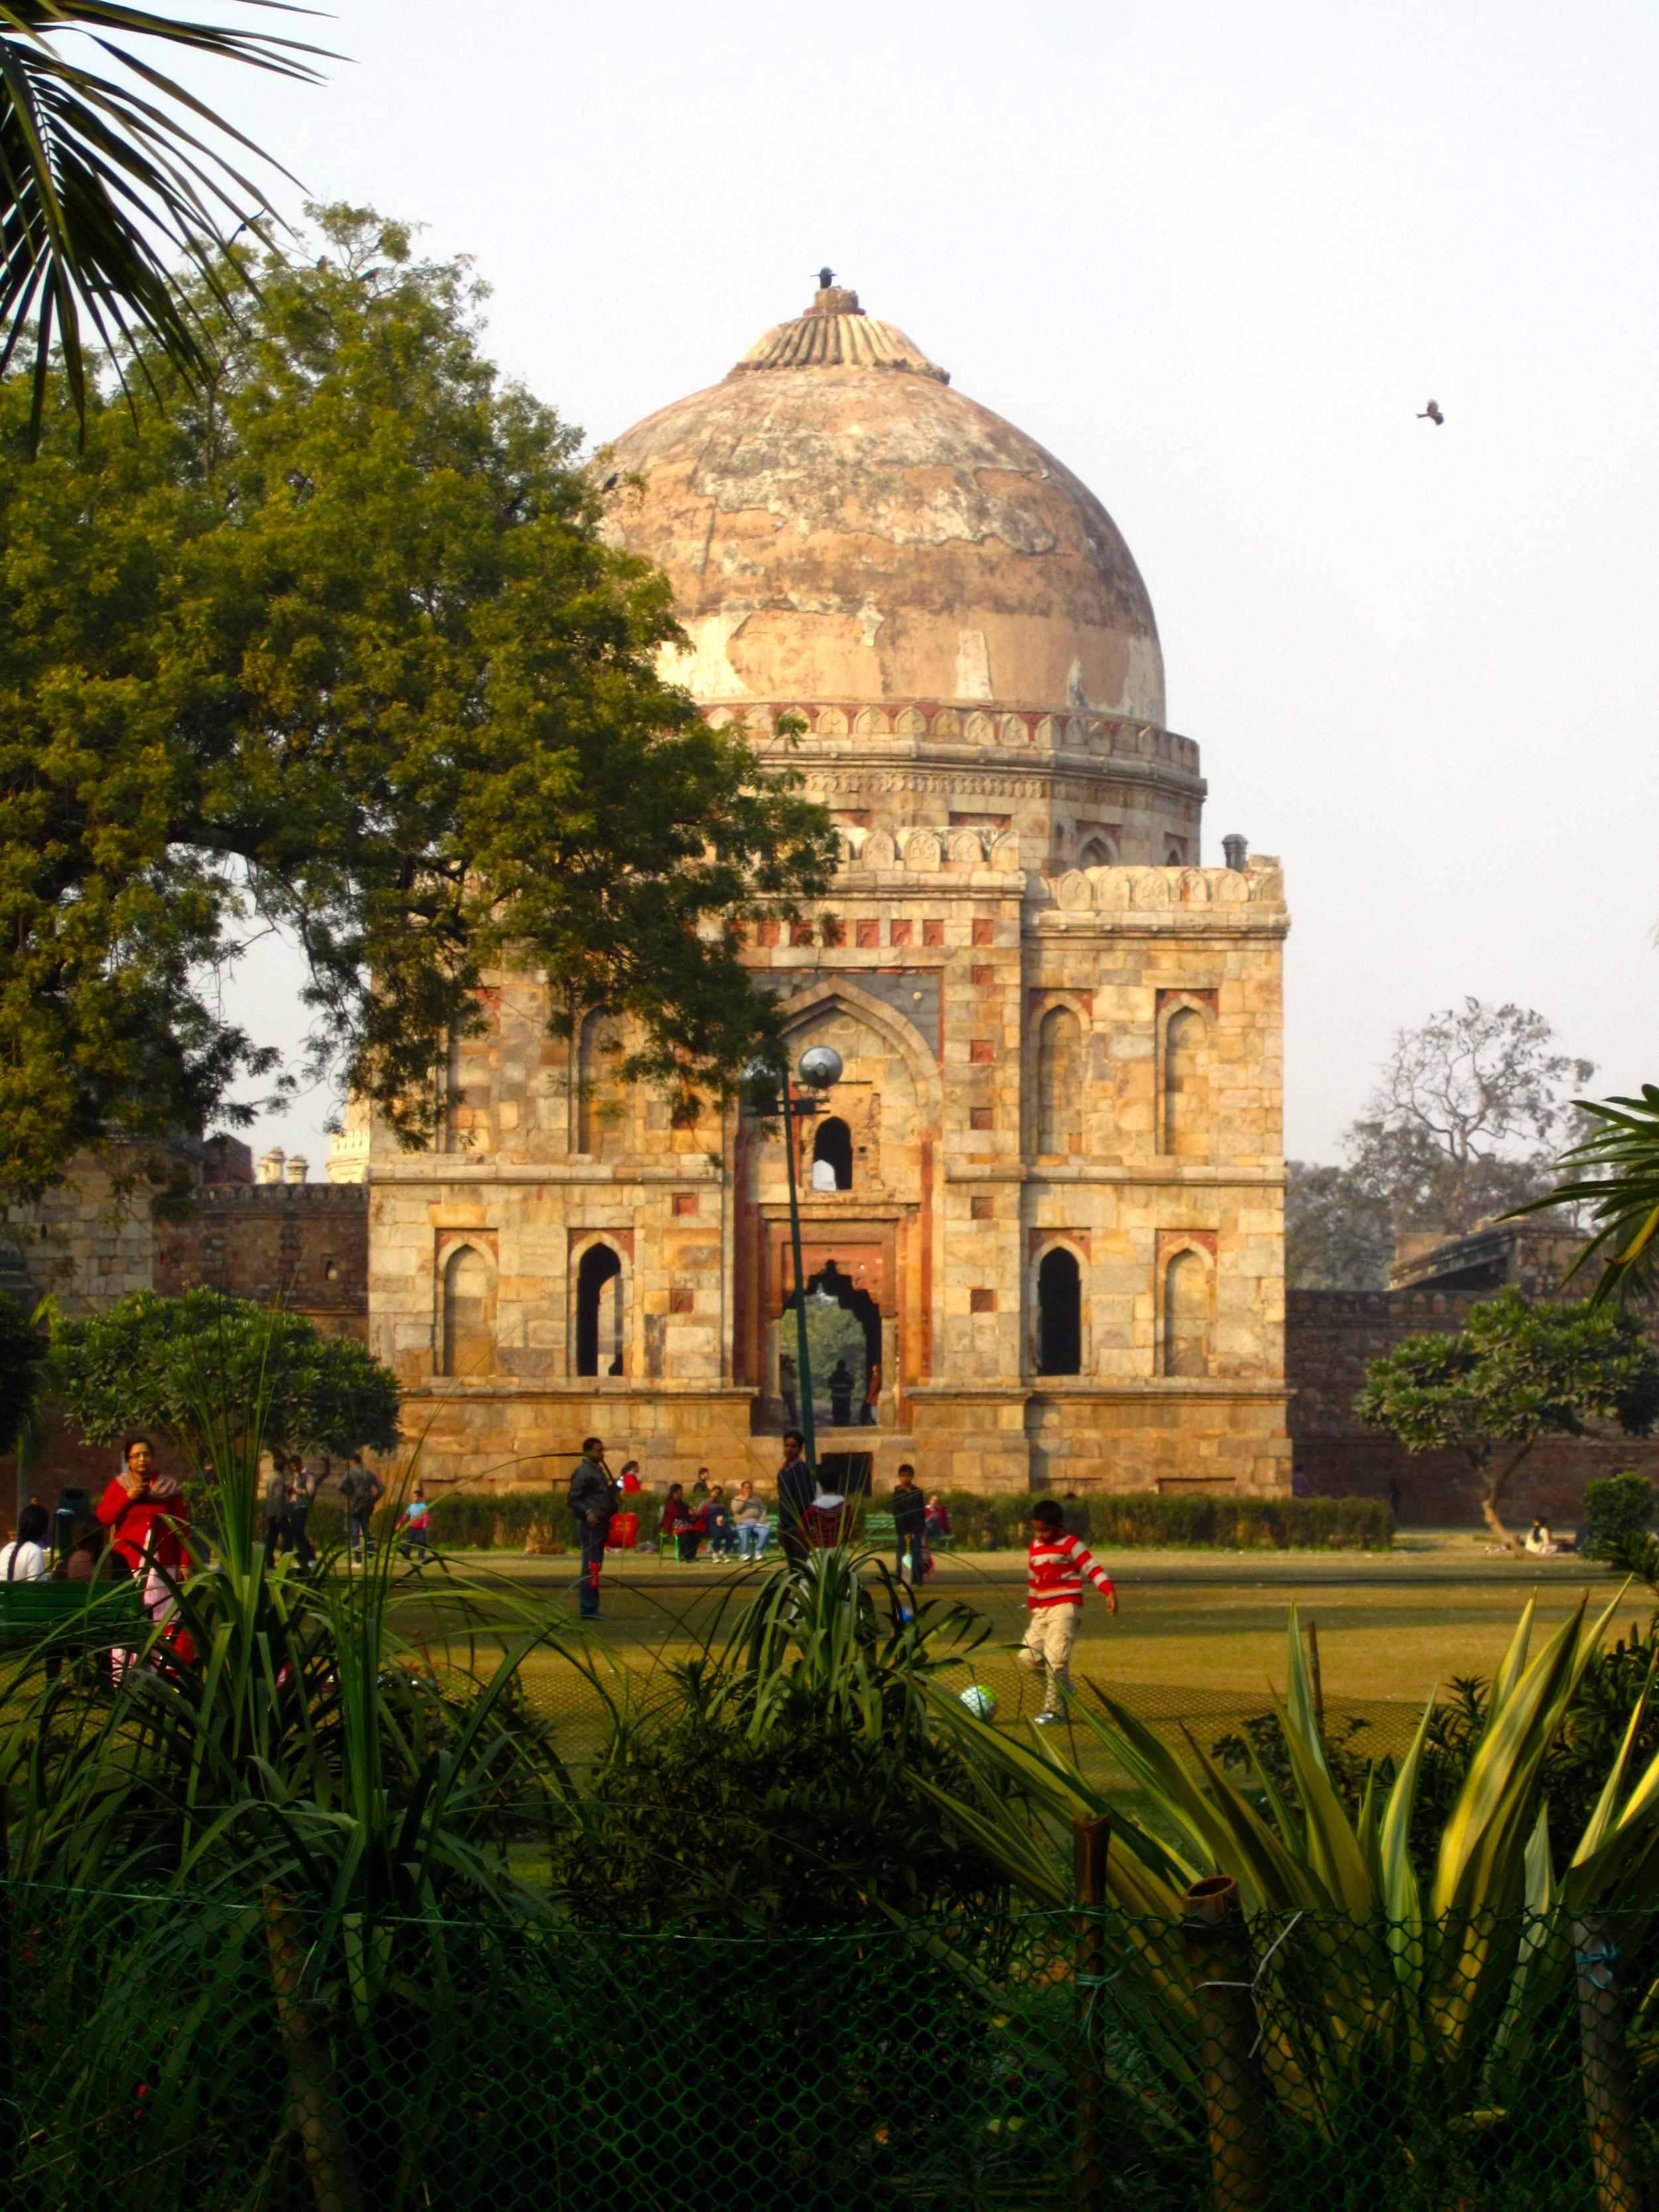 Delhi Agra 29Dec12 (2).jpg